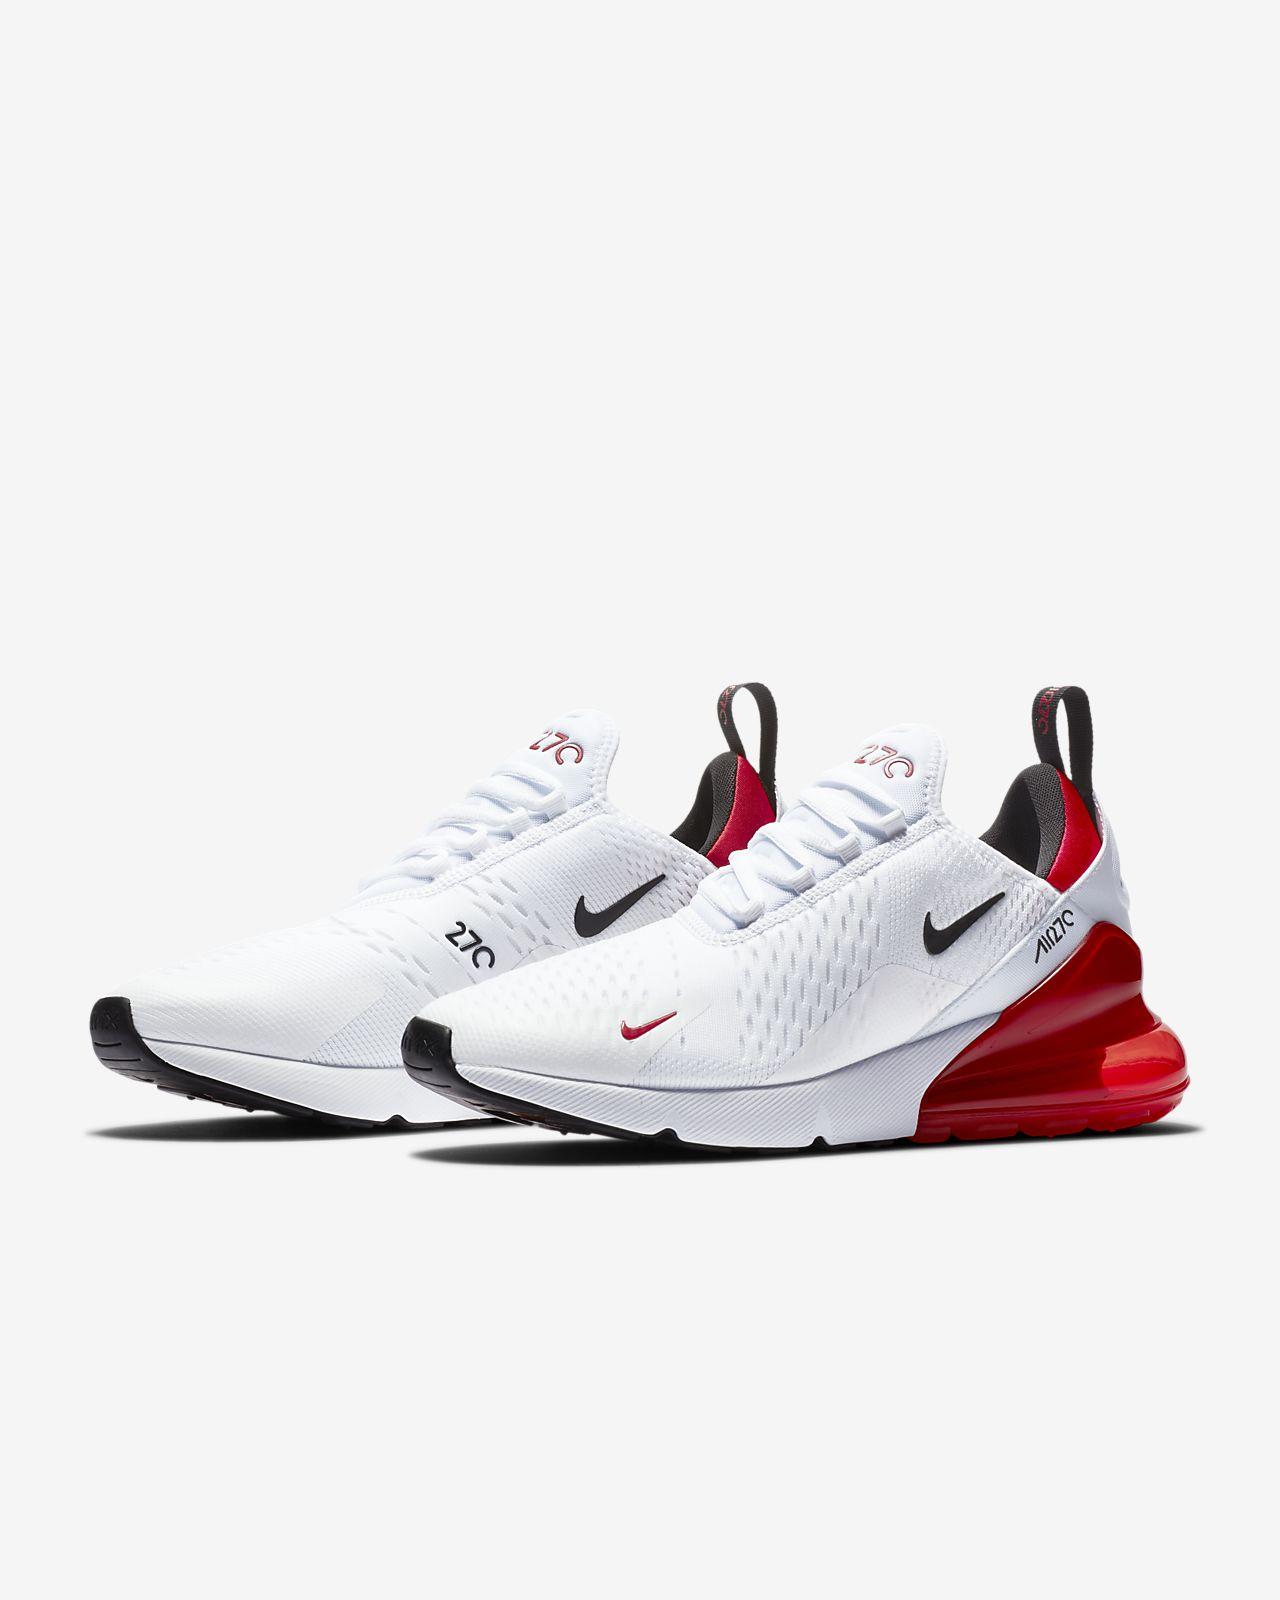 b5da5d1c Мужские кроссовки Nike Air Max 270. Nike.com RU